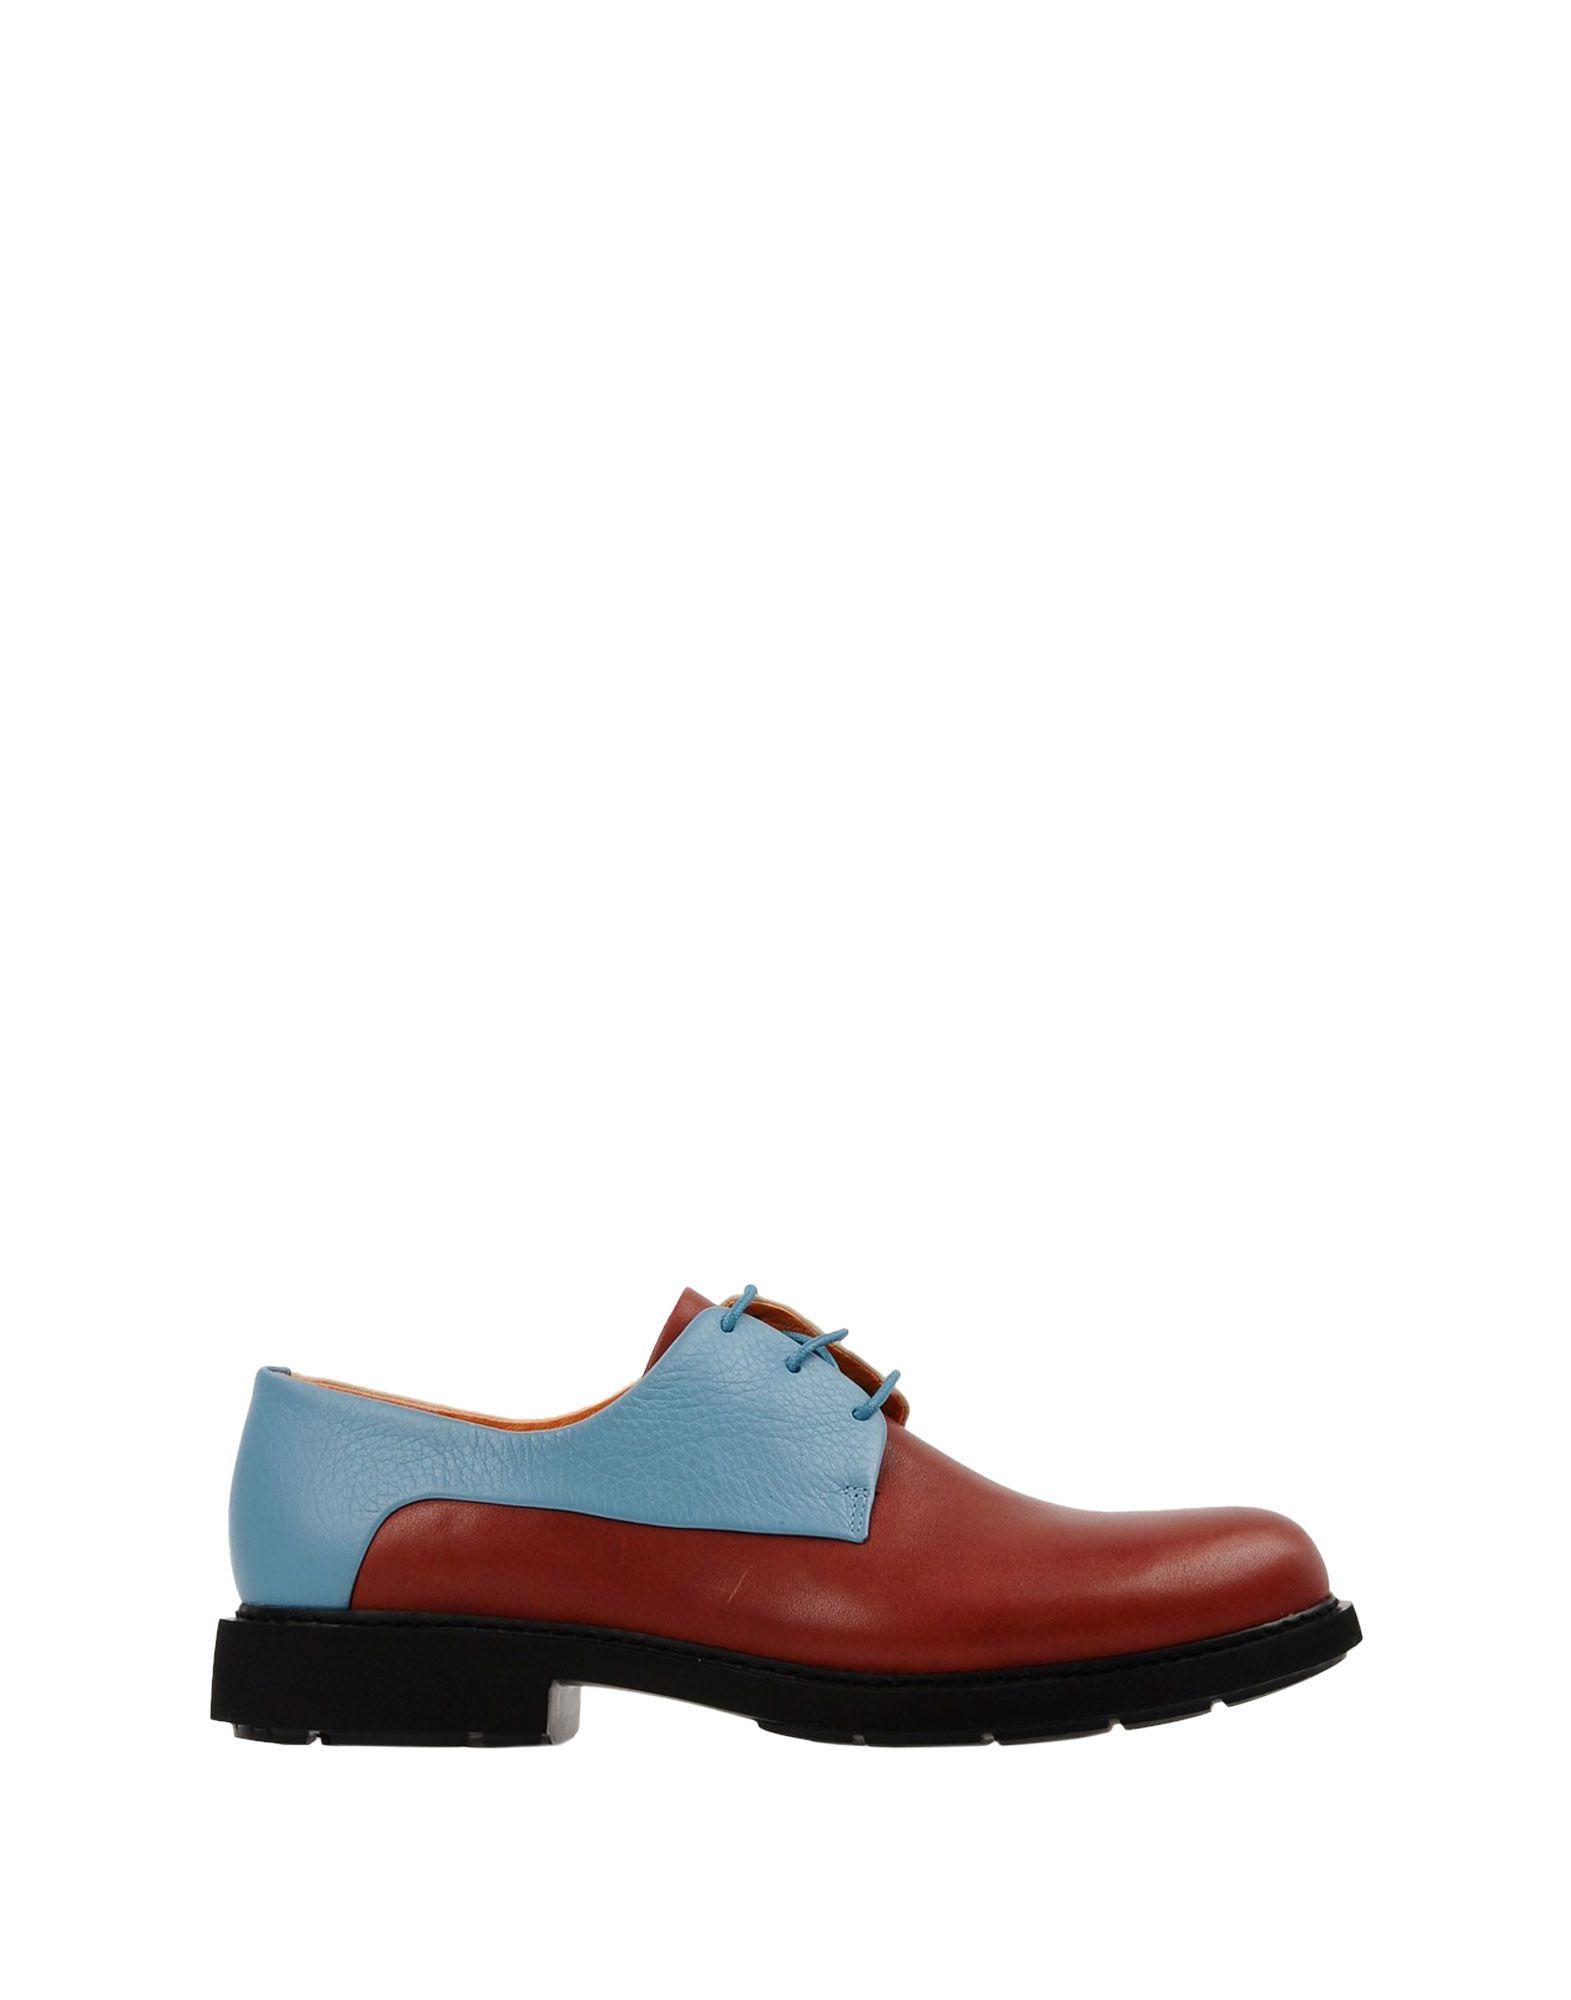 Chaussures - Tribunaux Bryan Blake lLicKloR